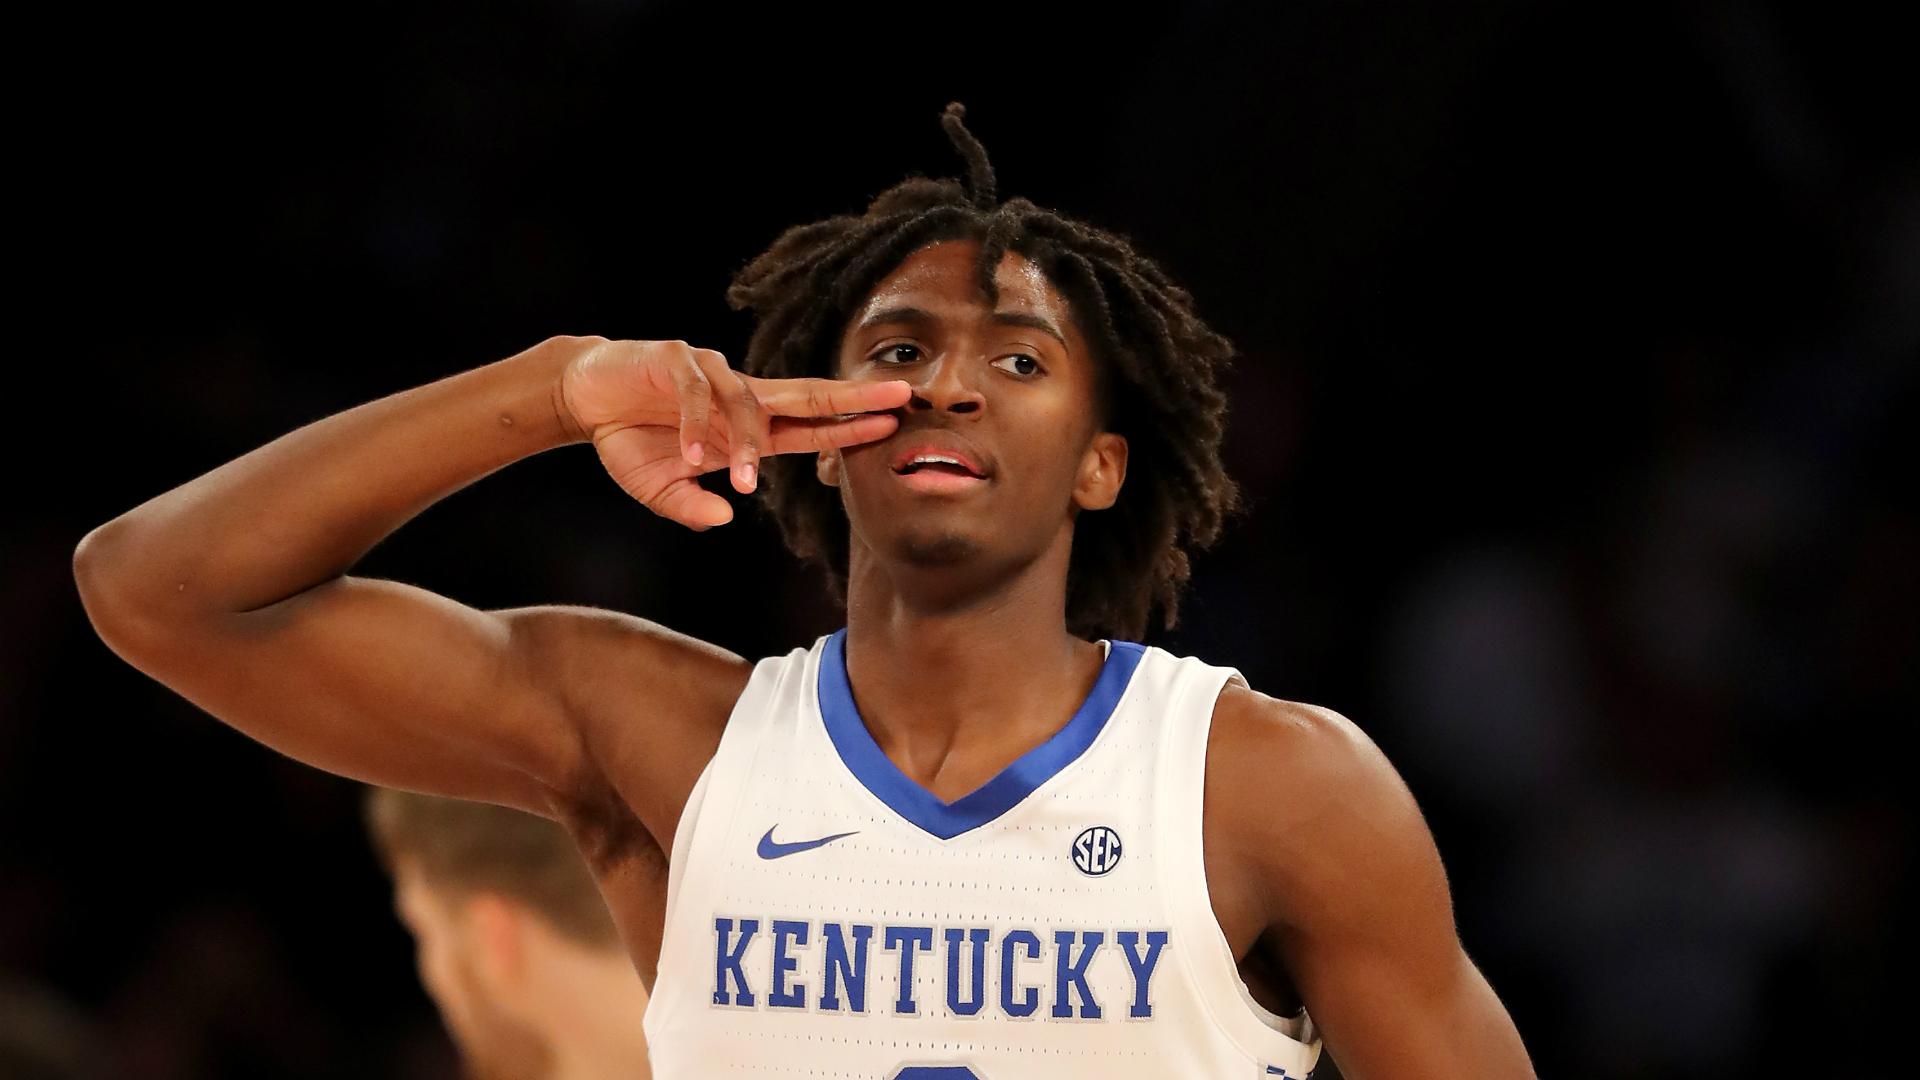 Nba Draft Prospect Roundup Kentucky S Tyrese Maxey Shines Duke Stars Struggle At Champions Classic Sporting News